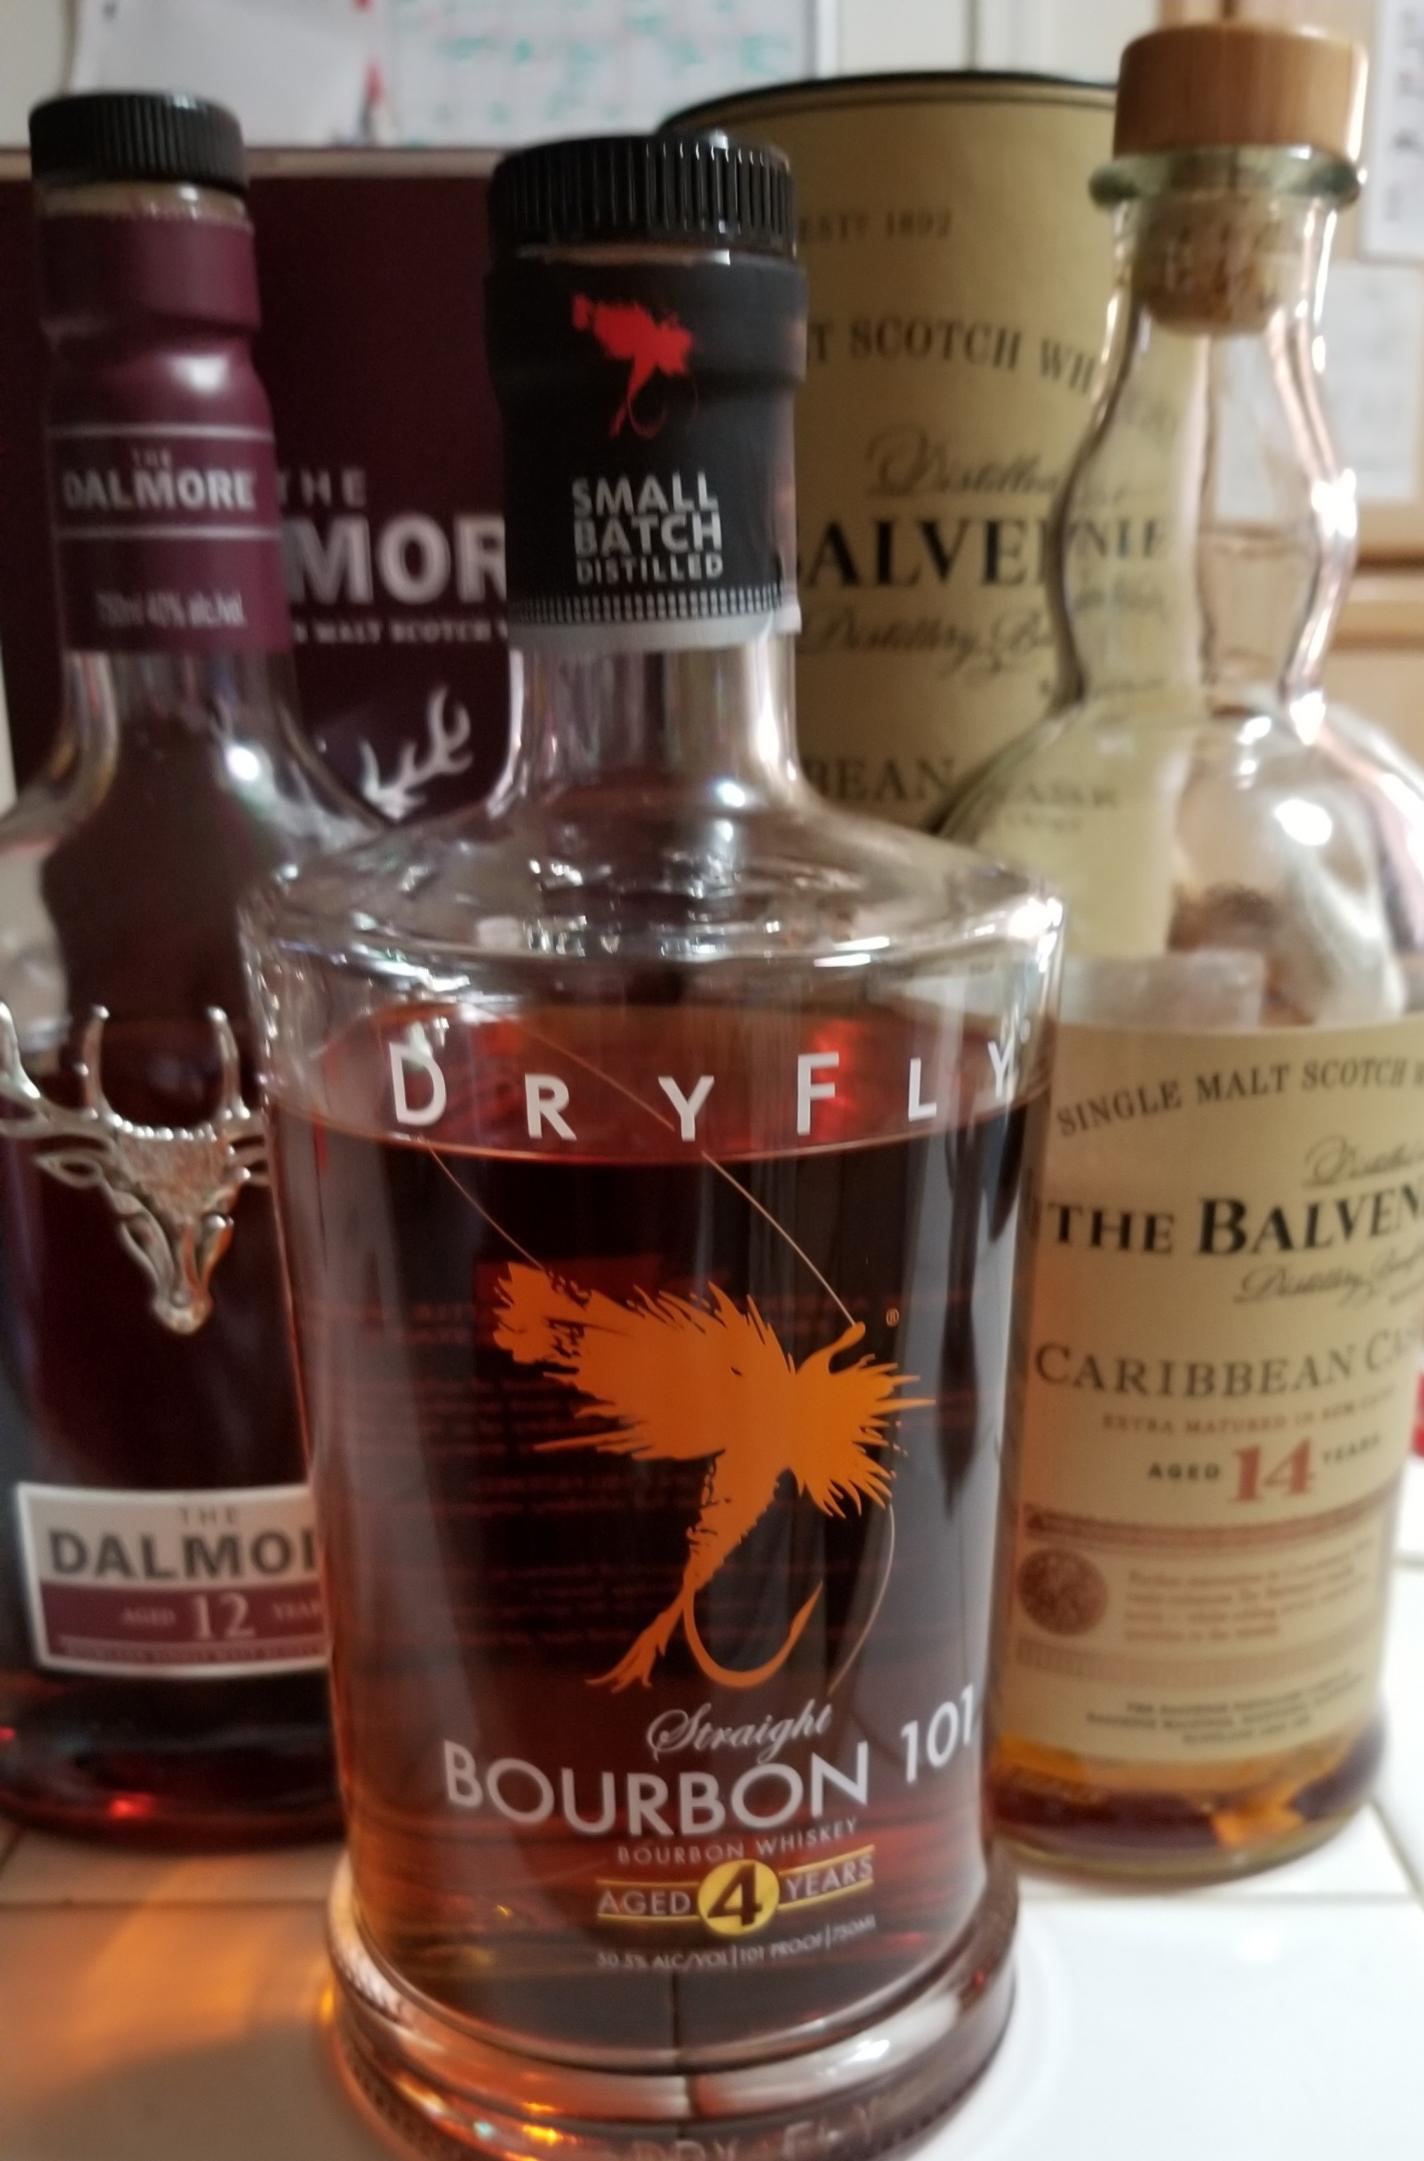 Dry fly staright bourbon 101 1 of 2.jpg